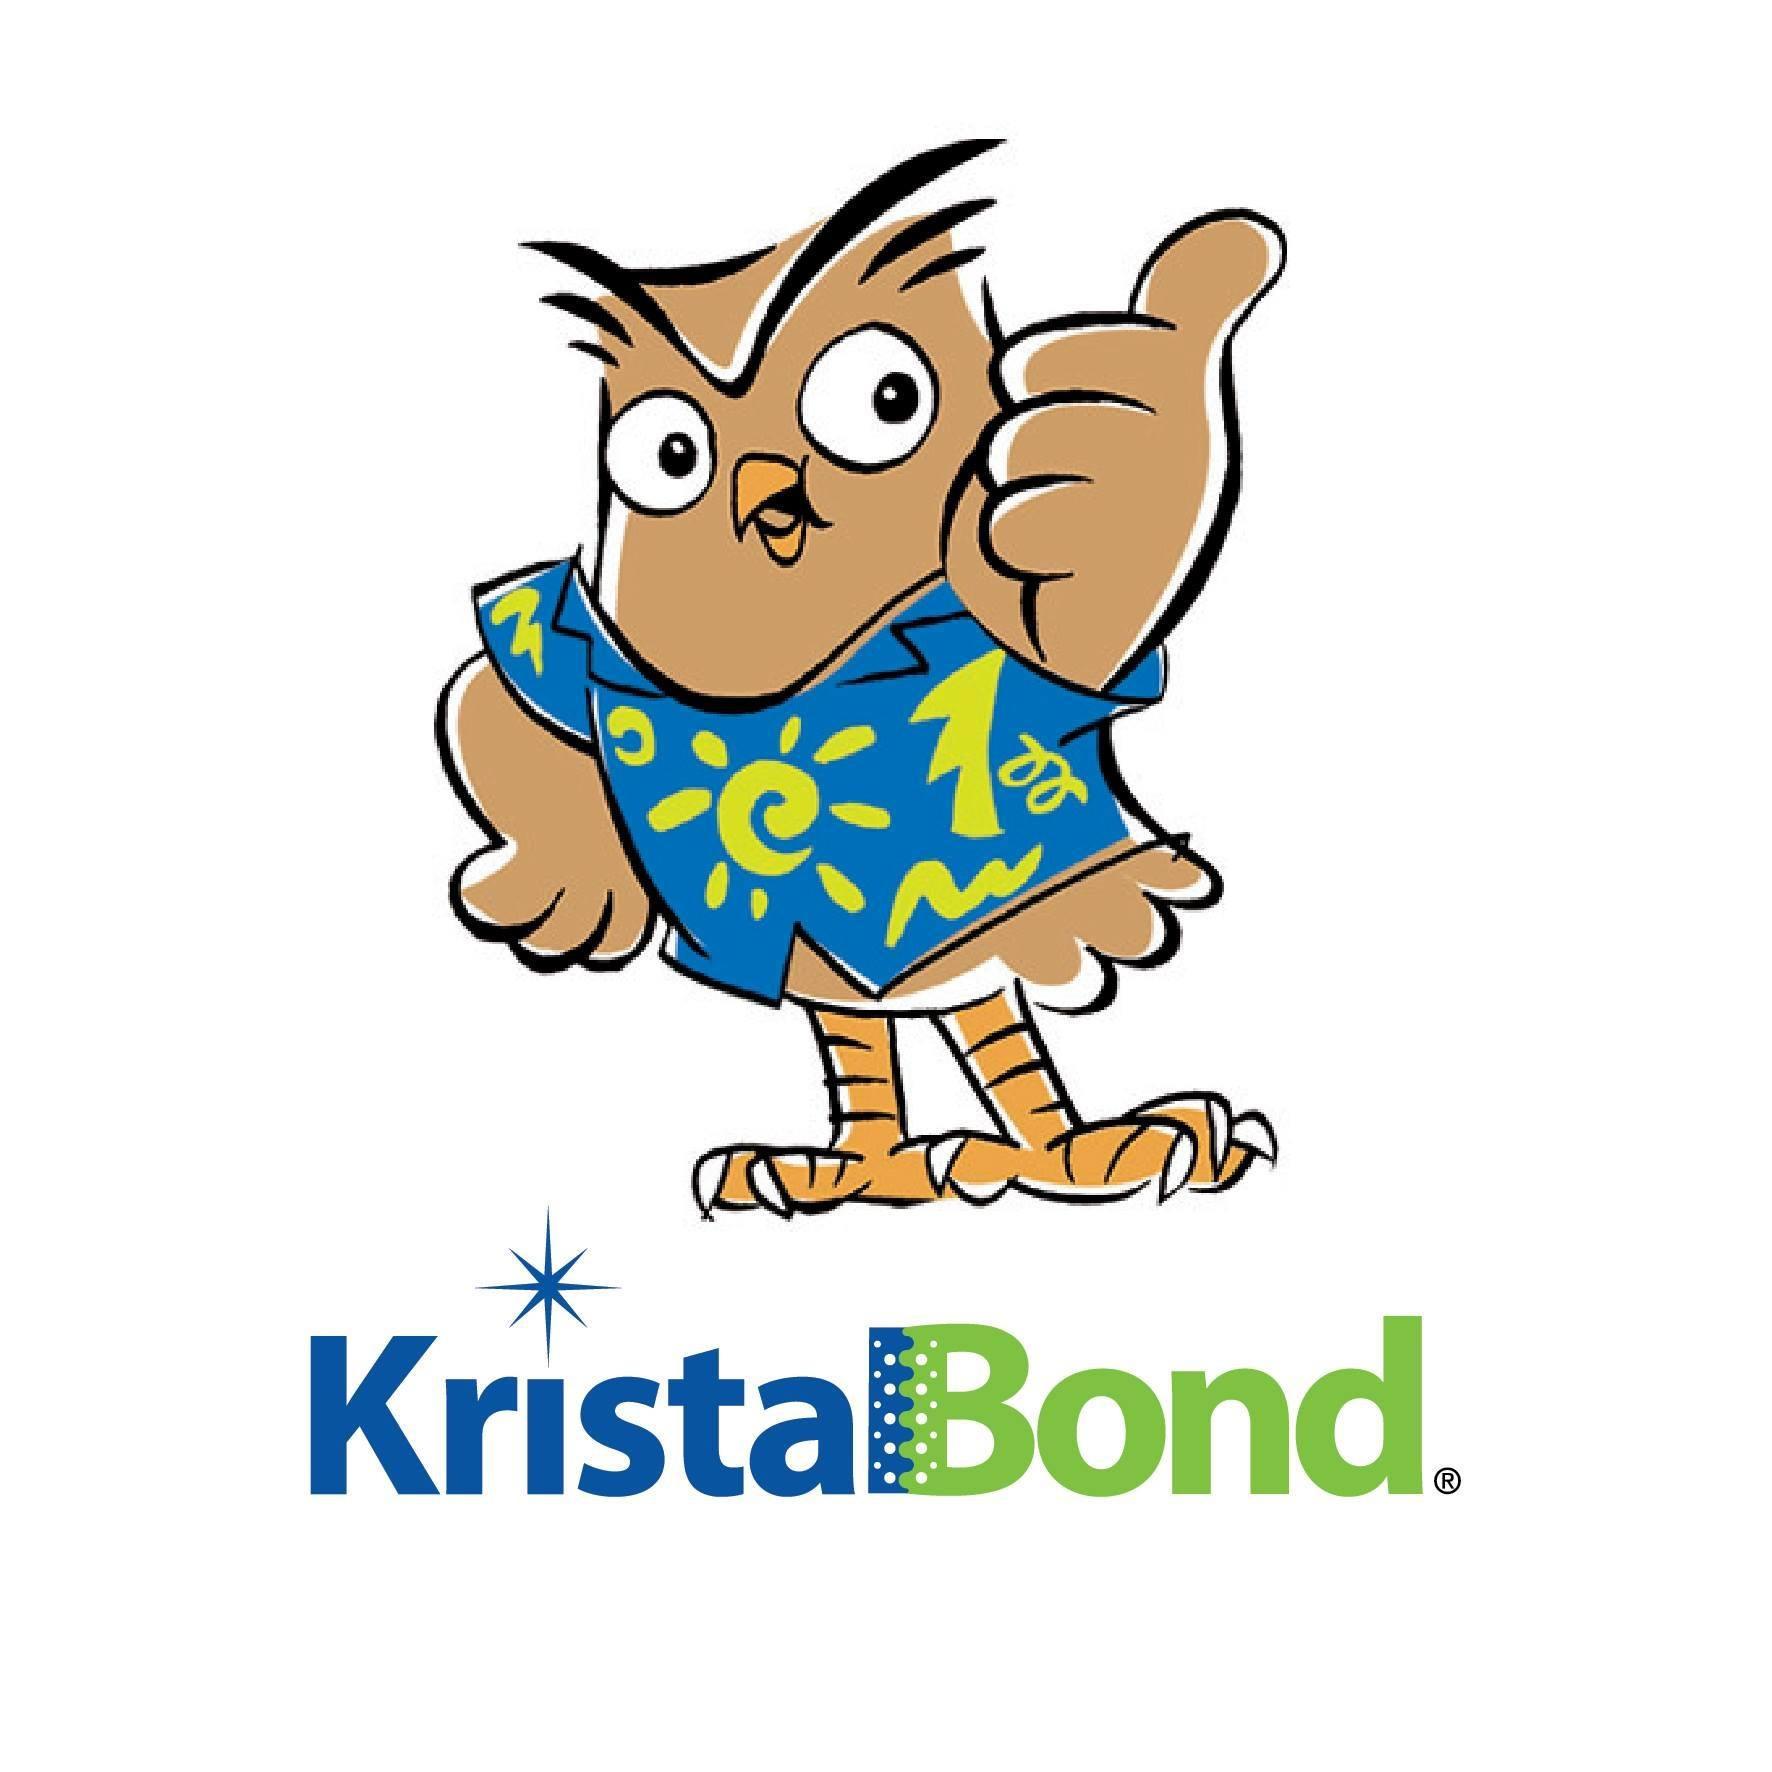 KristalBond Technologies Sdn Bhd